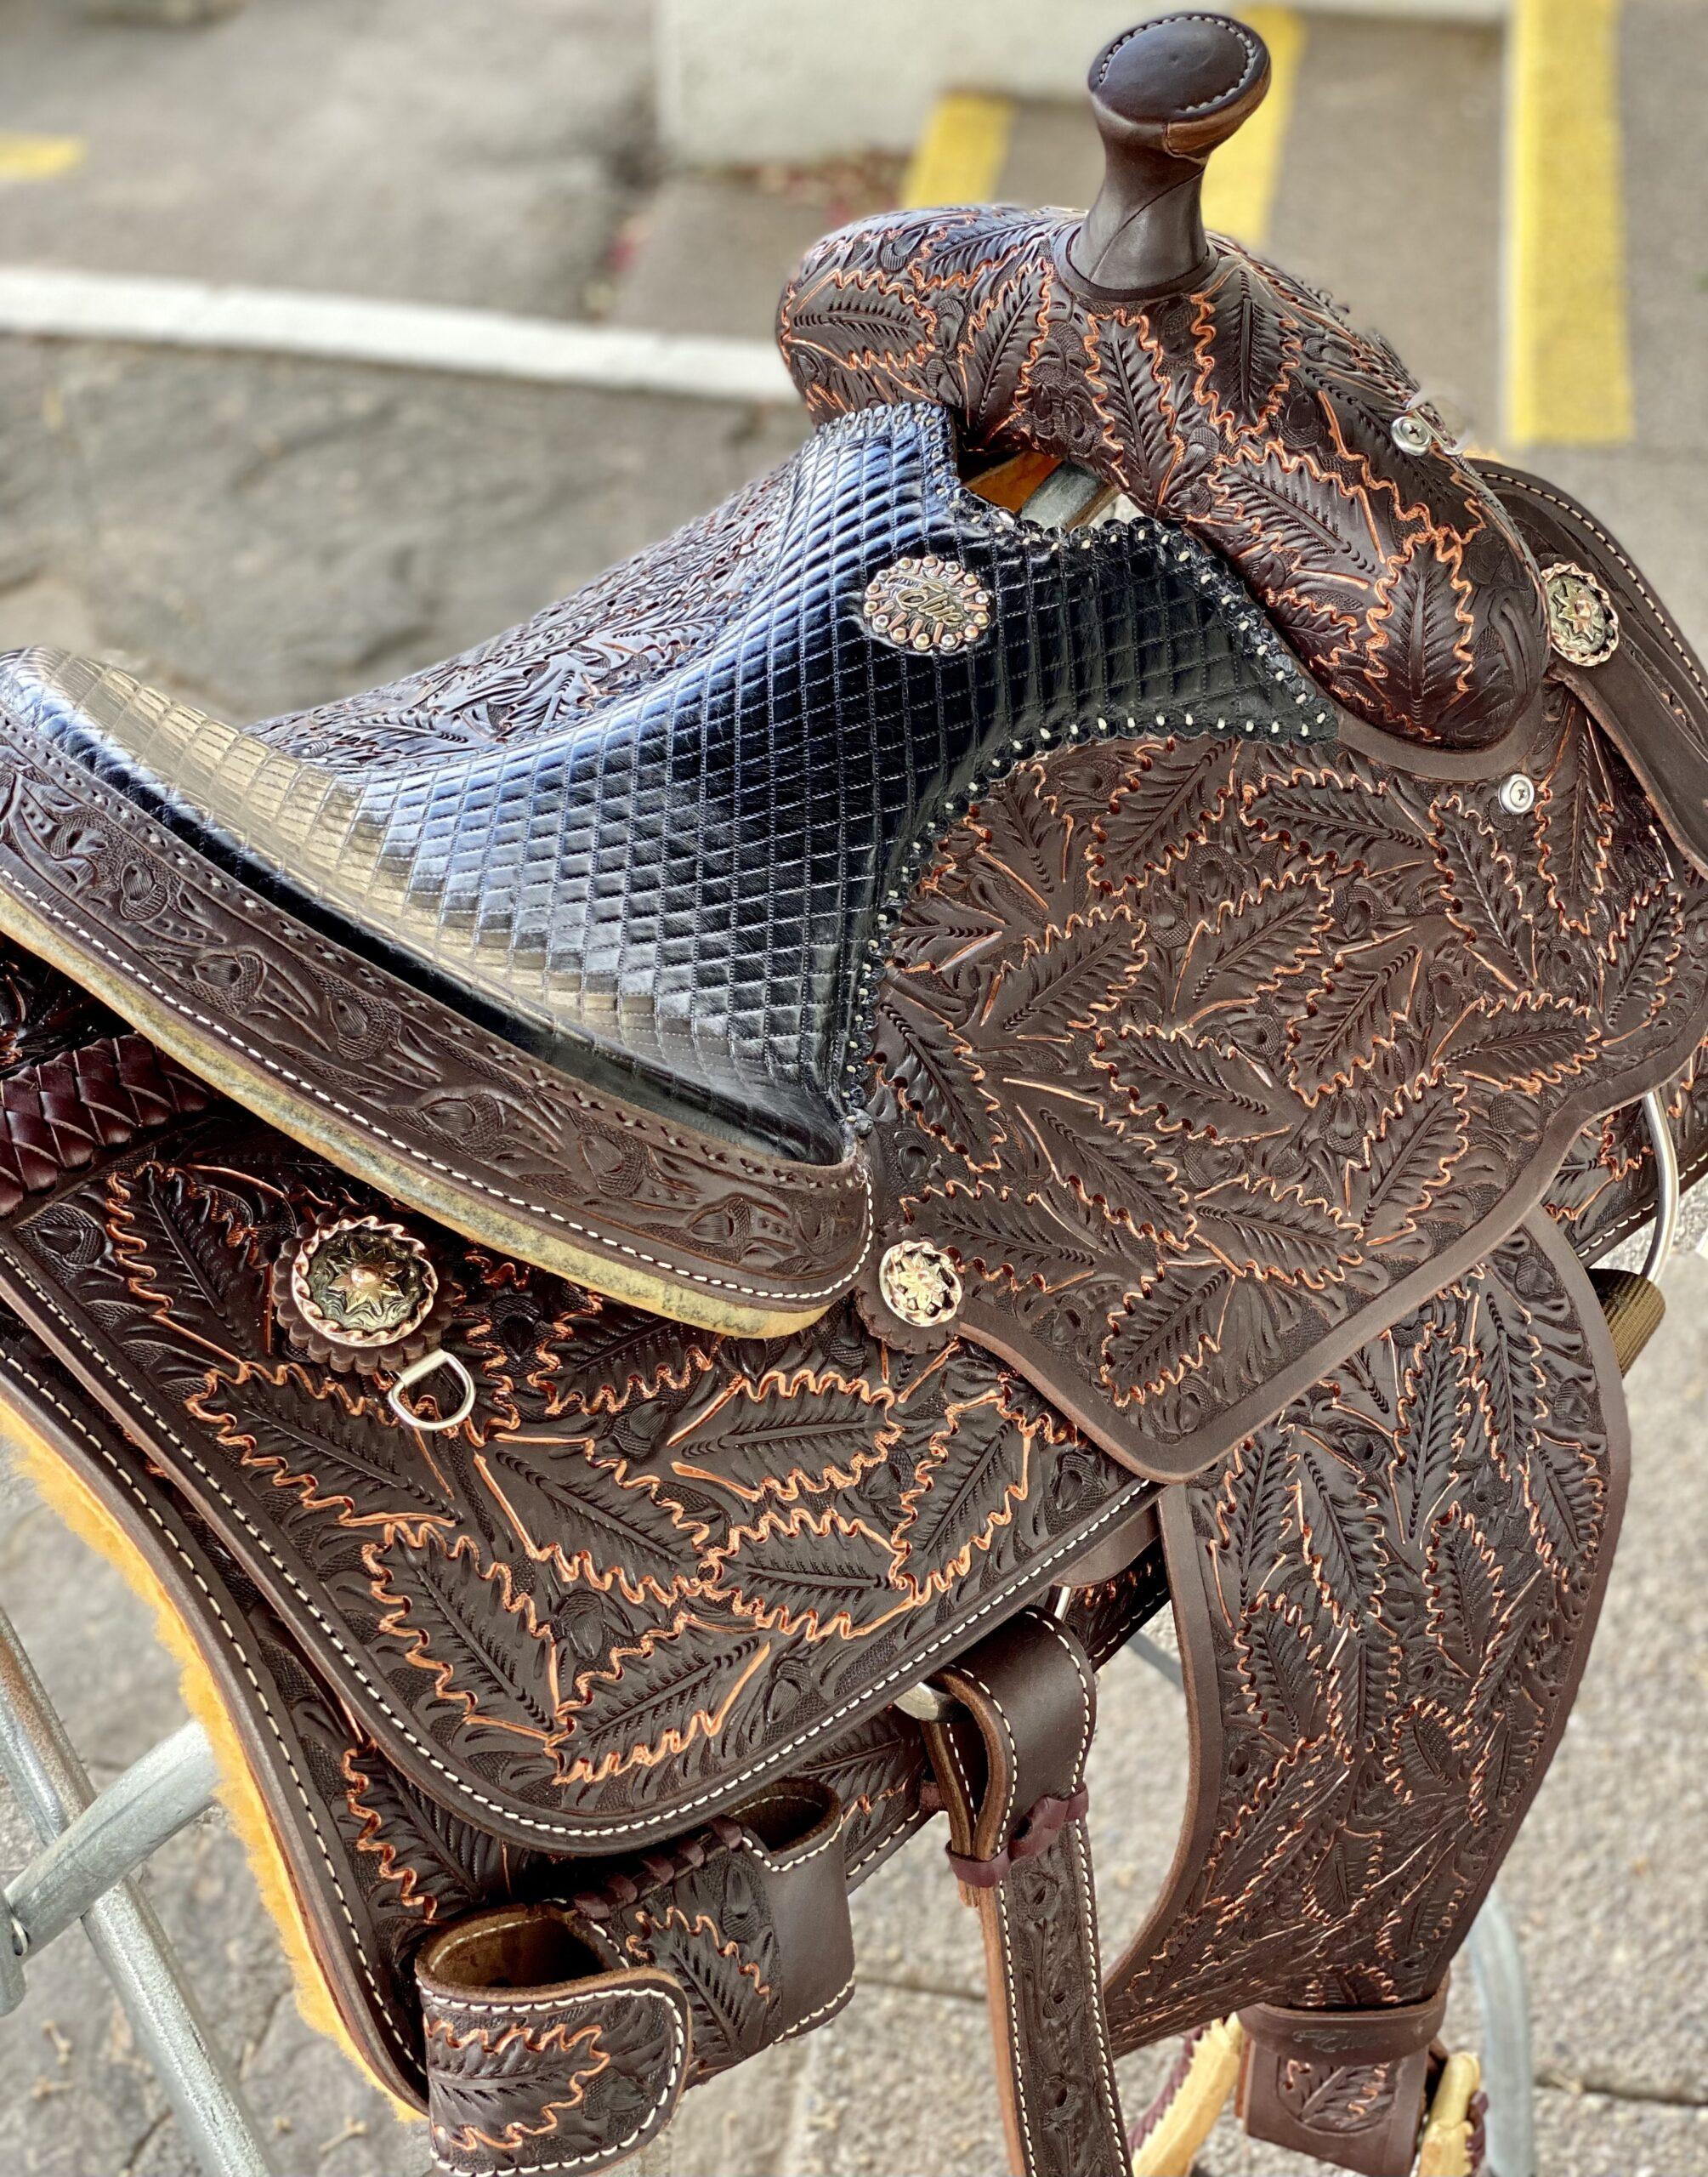 <b>15in</b><p>MJ001 Mike Johnson fully tooled roper saddle </P>